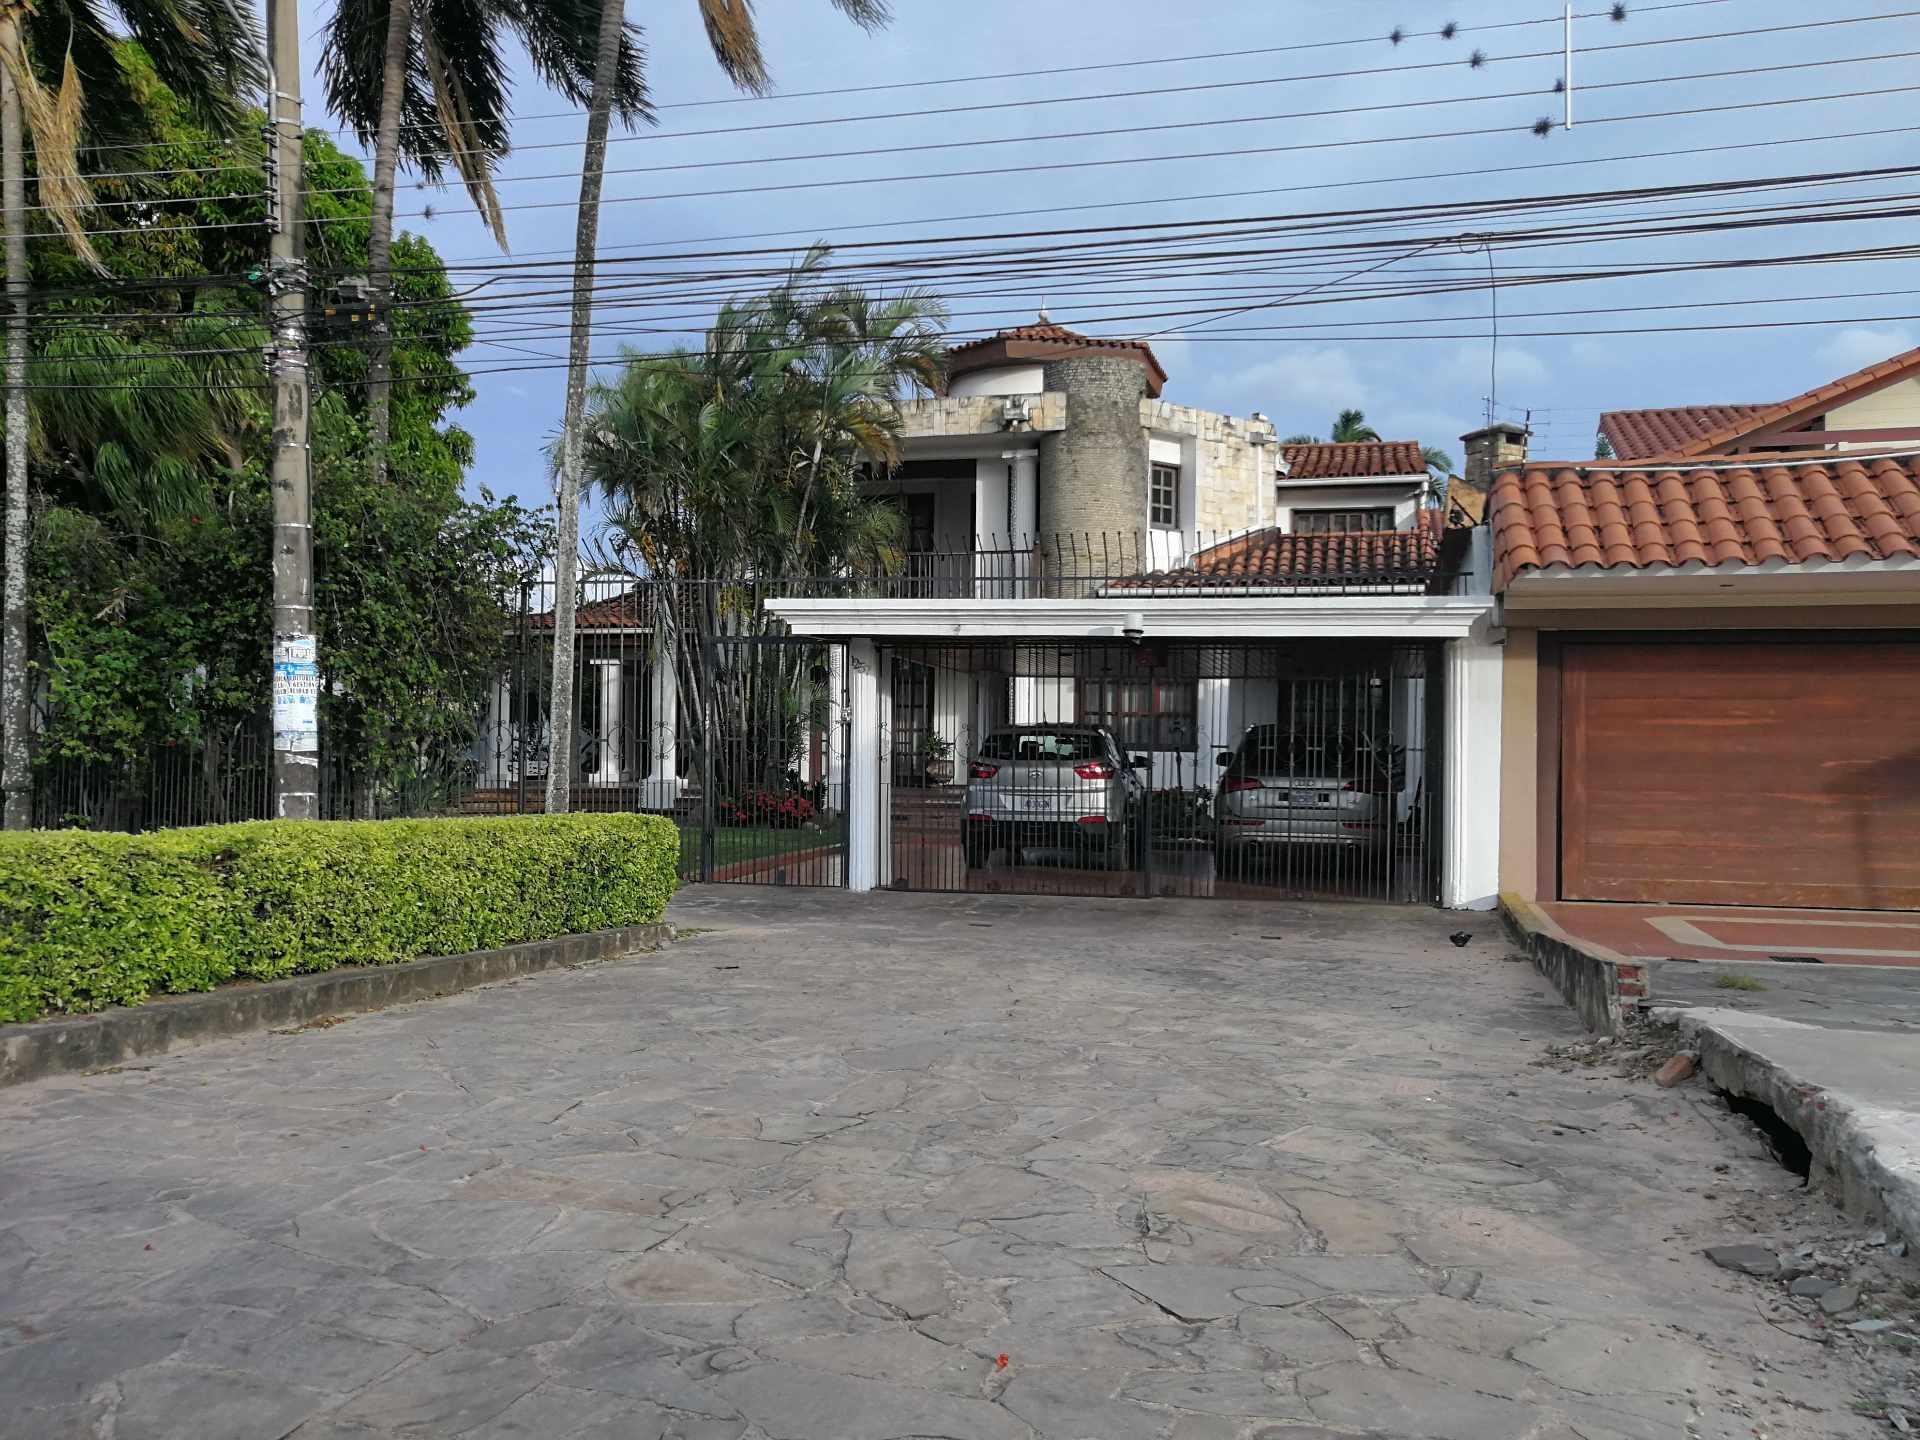 Casa en Venta ZONA SUR - SOBRE SOBRE SEGUNDO ANILLO PARQUE URBANO Foto 19